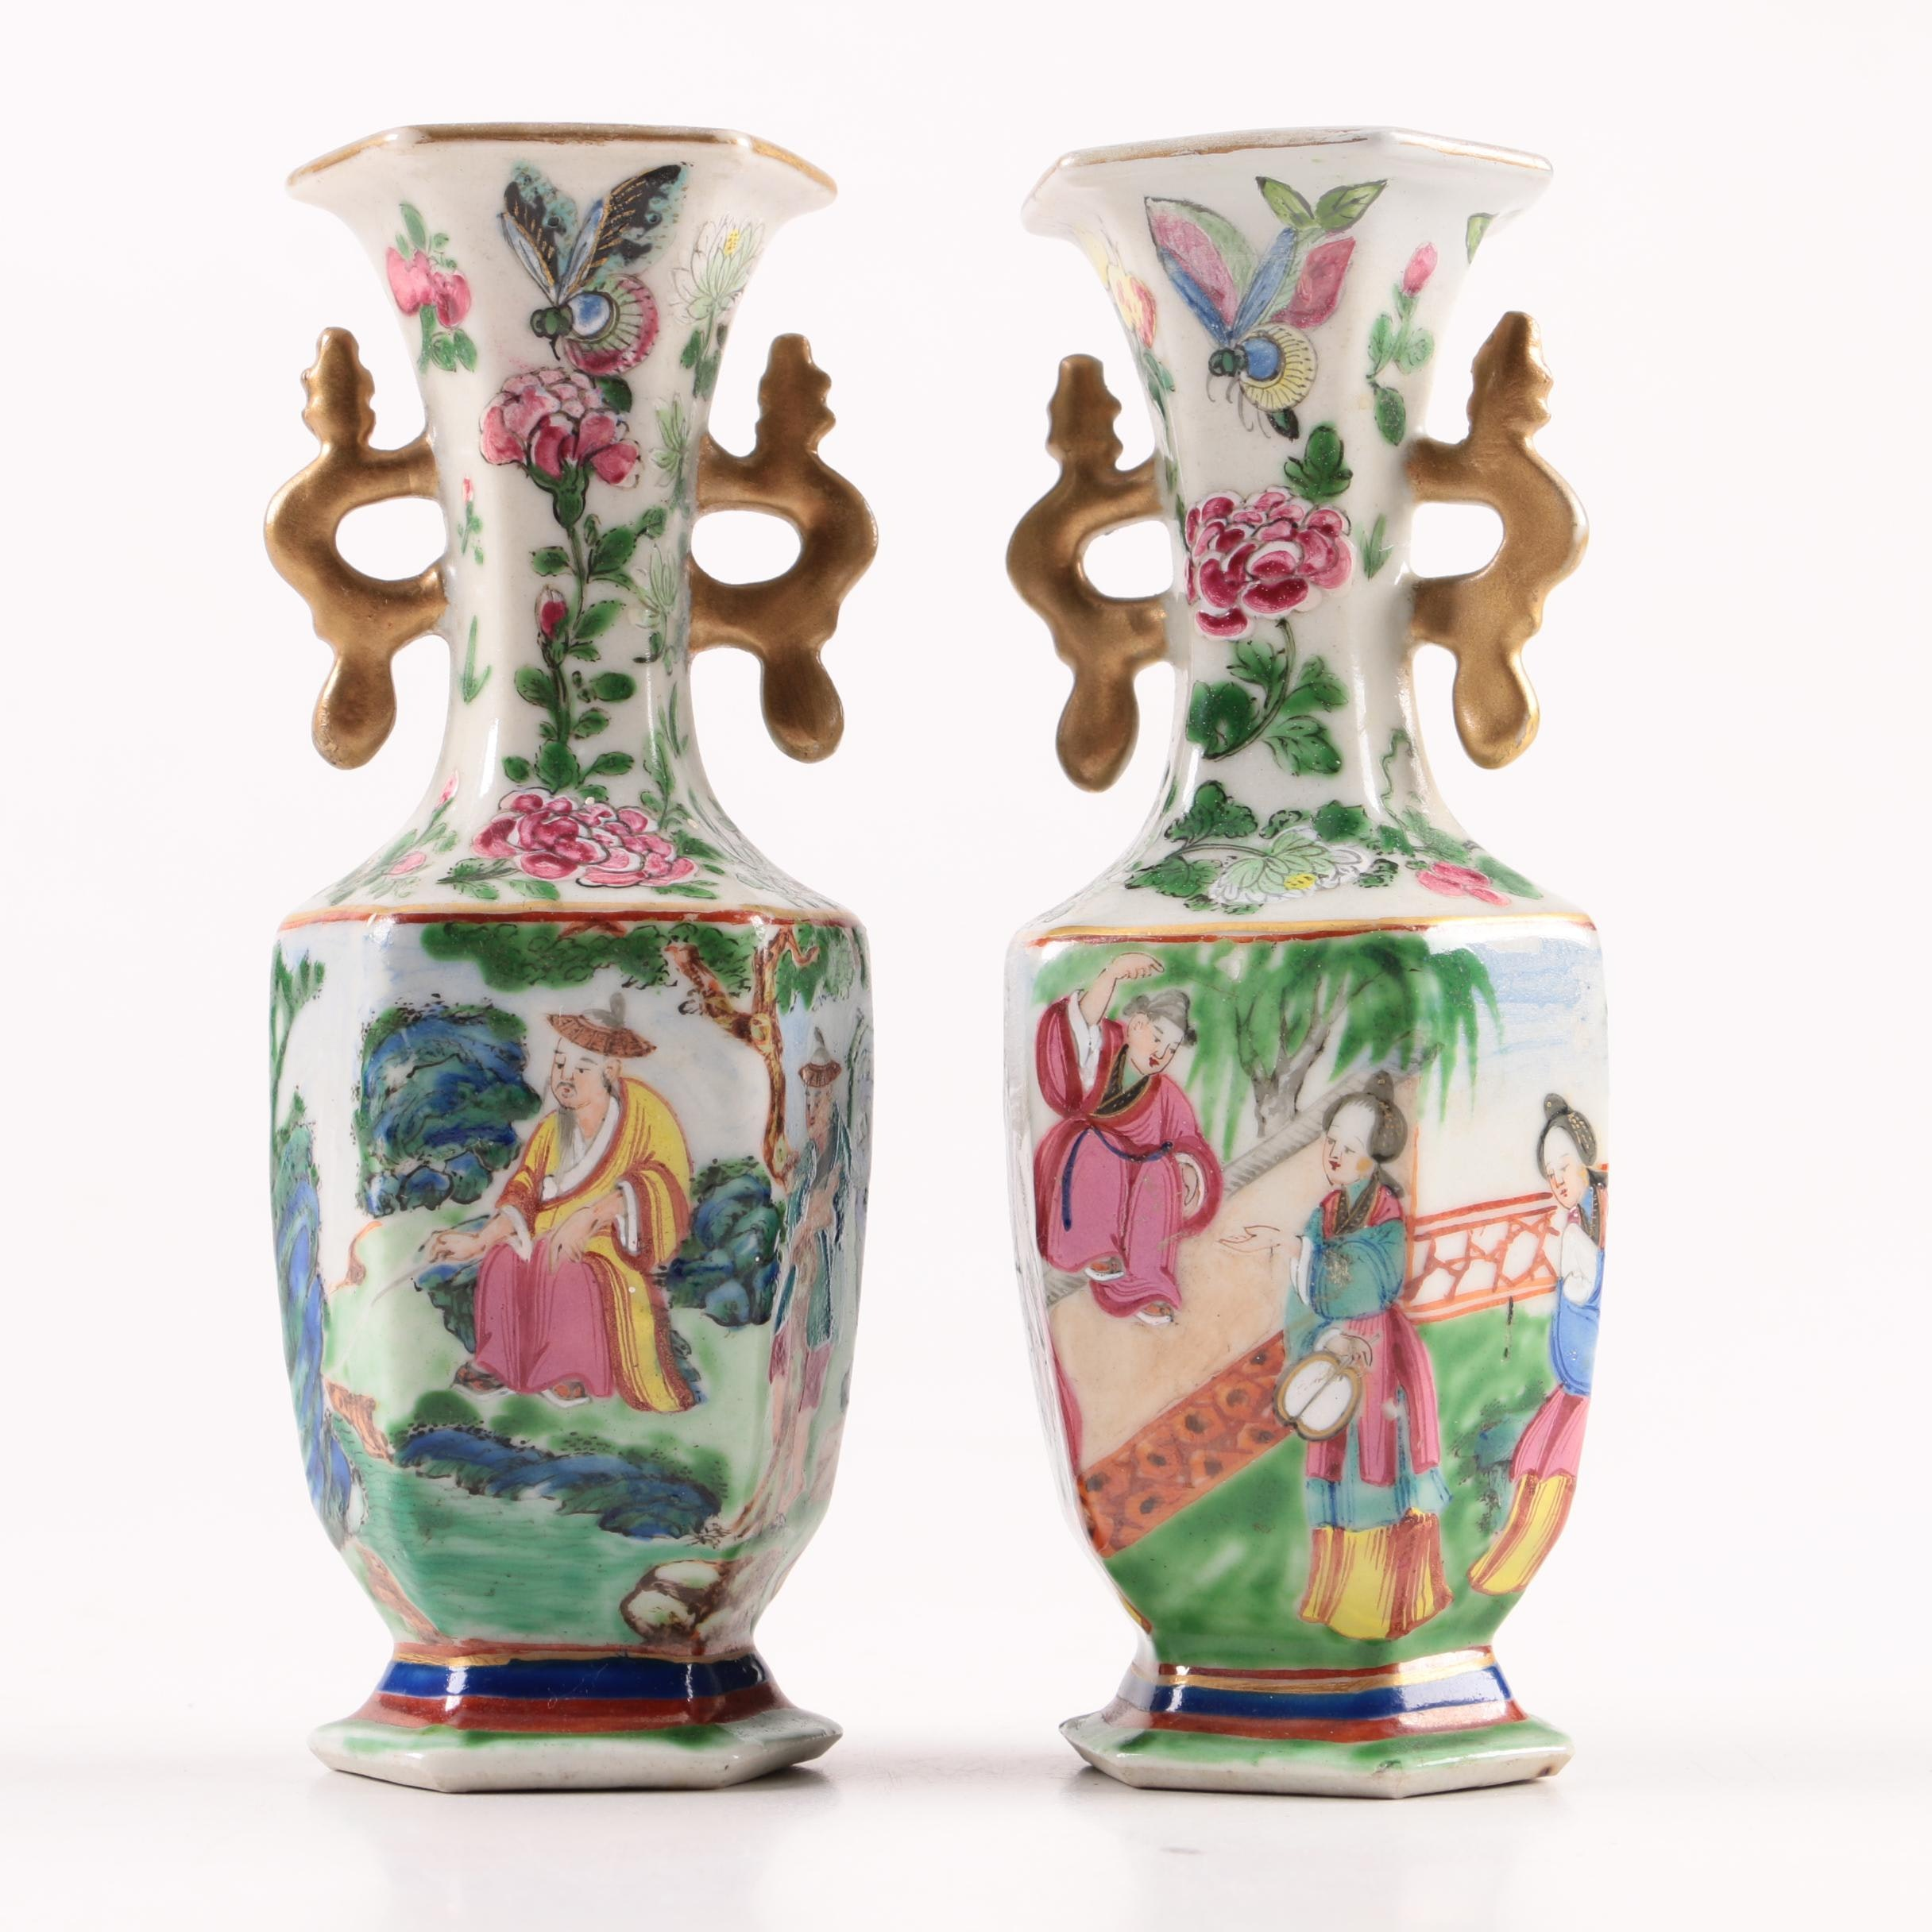 Pair of East Asian Style Porcilain Vases